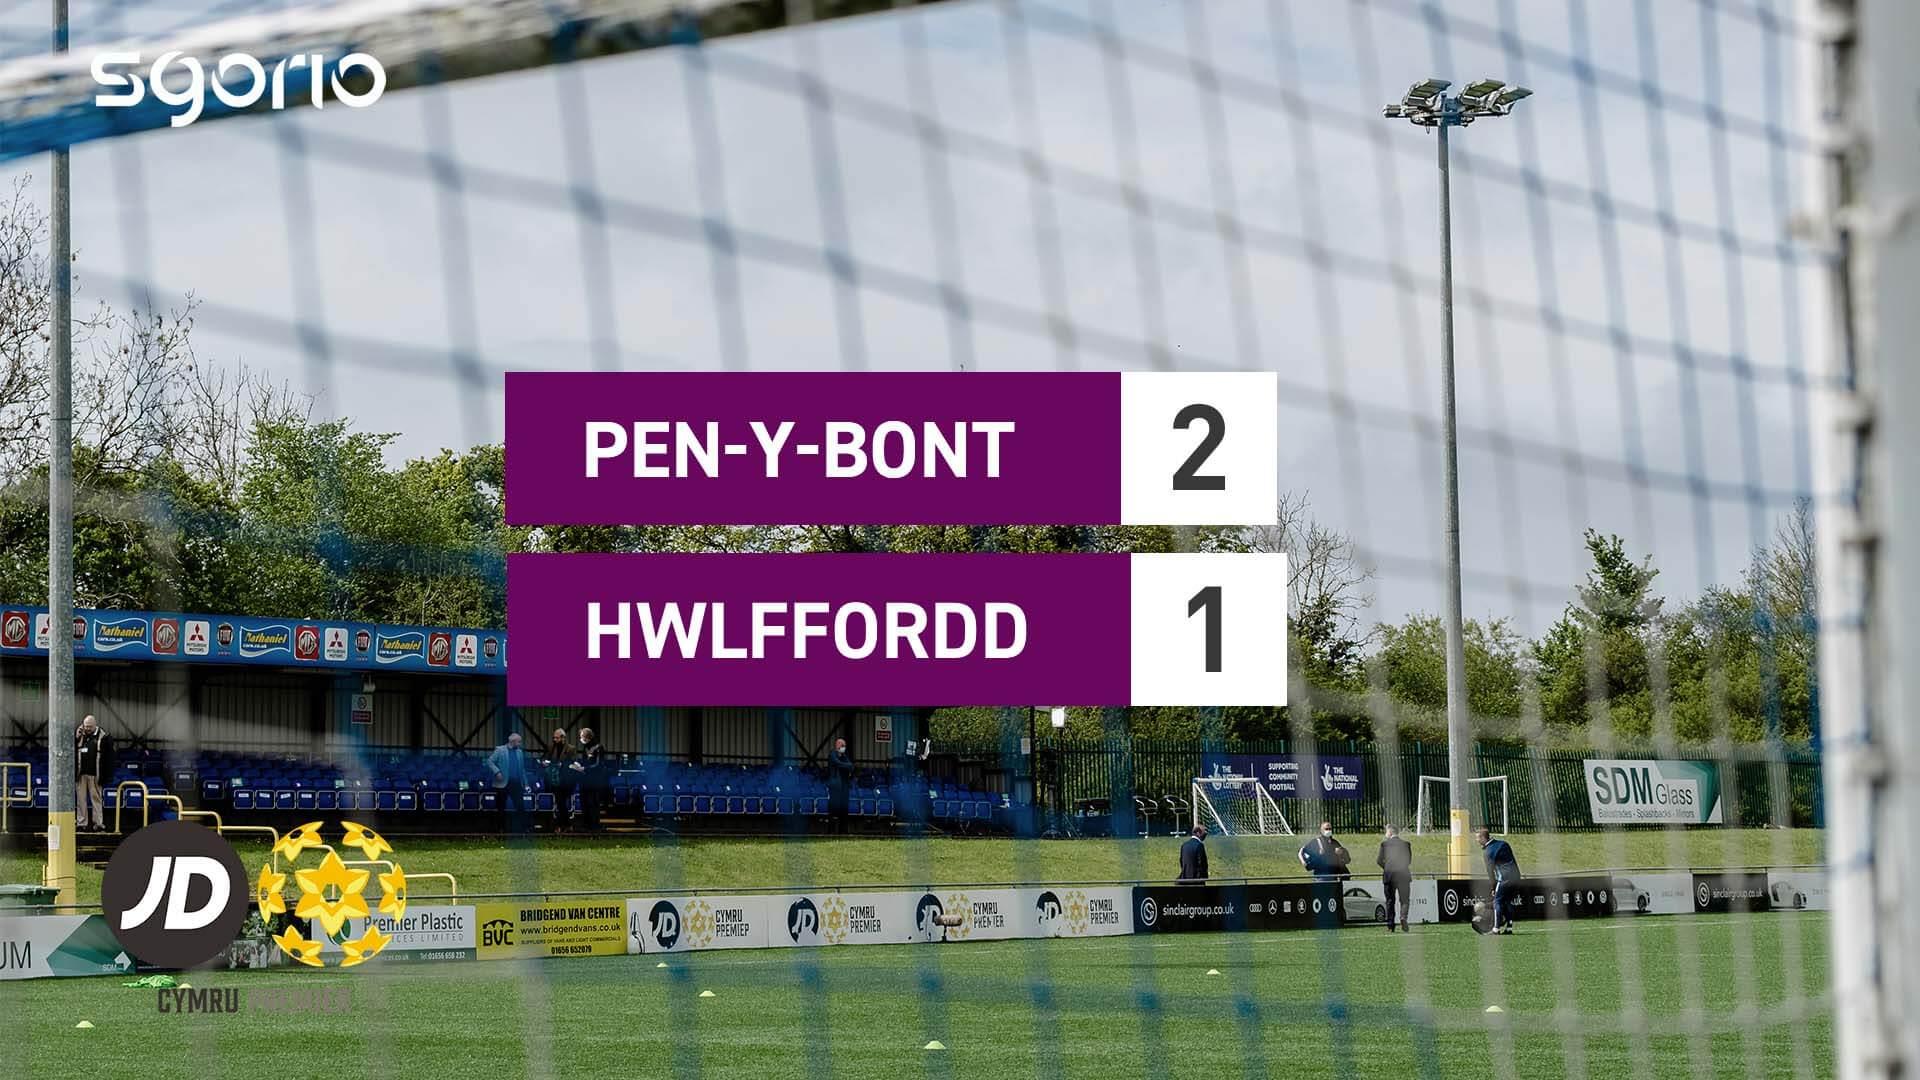 Pen-y-bont 2-1 Hwlffordd